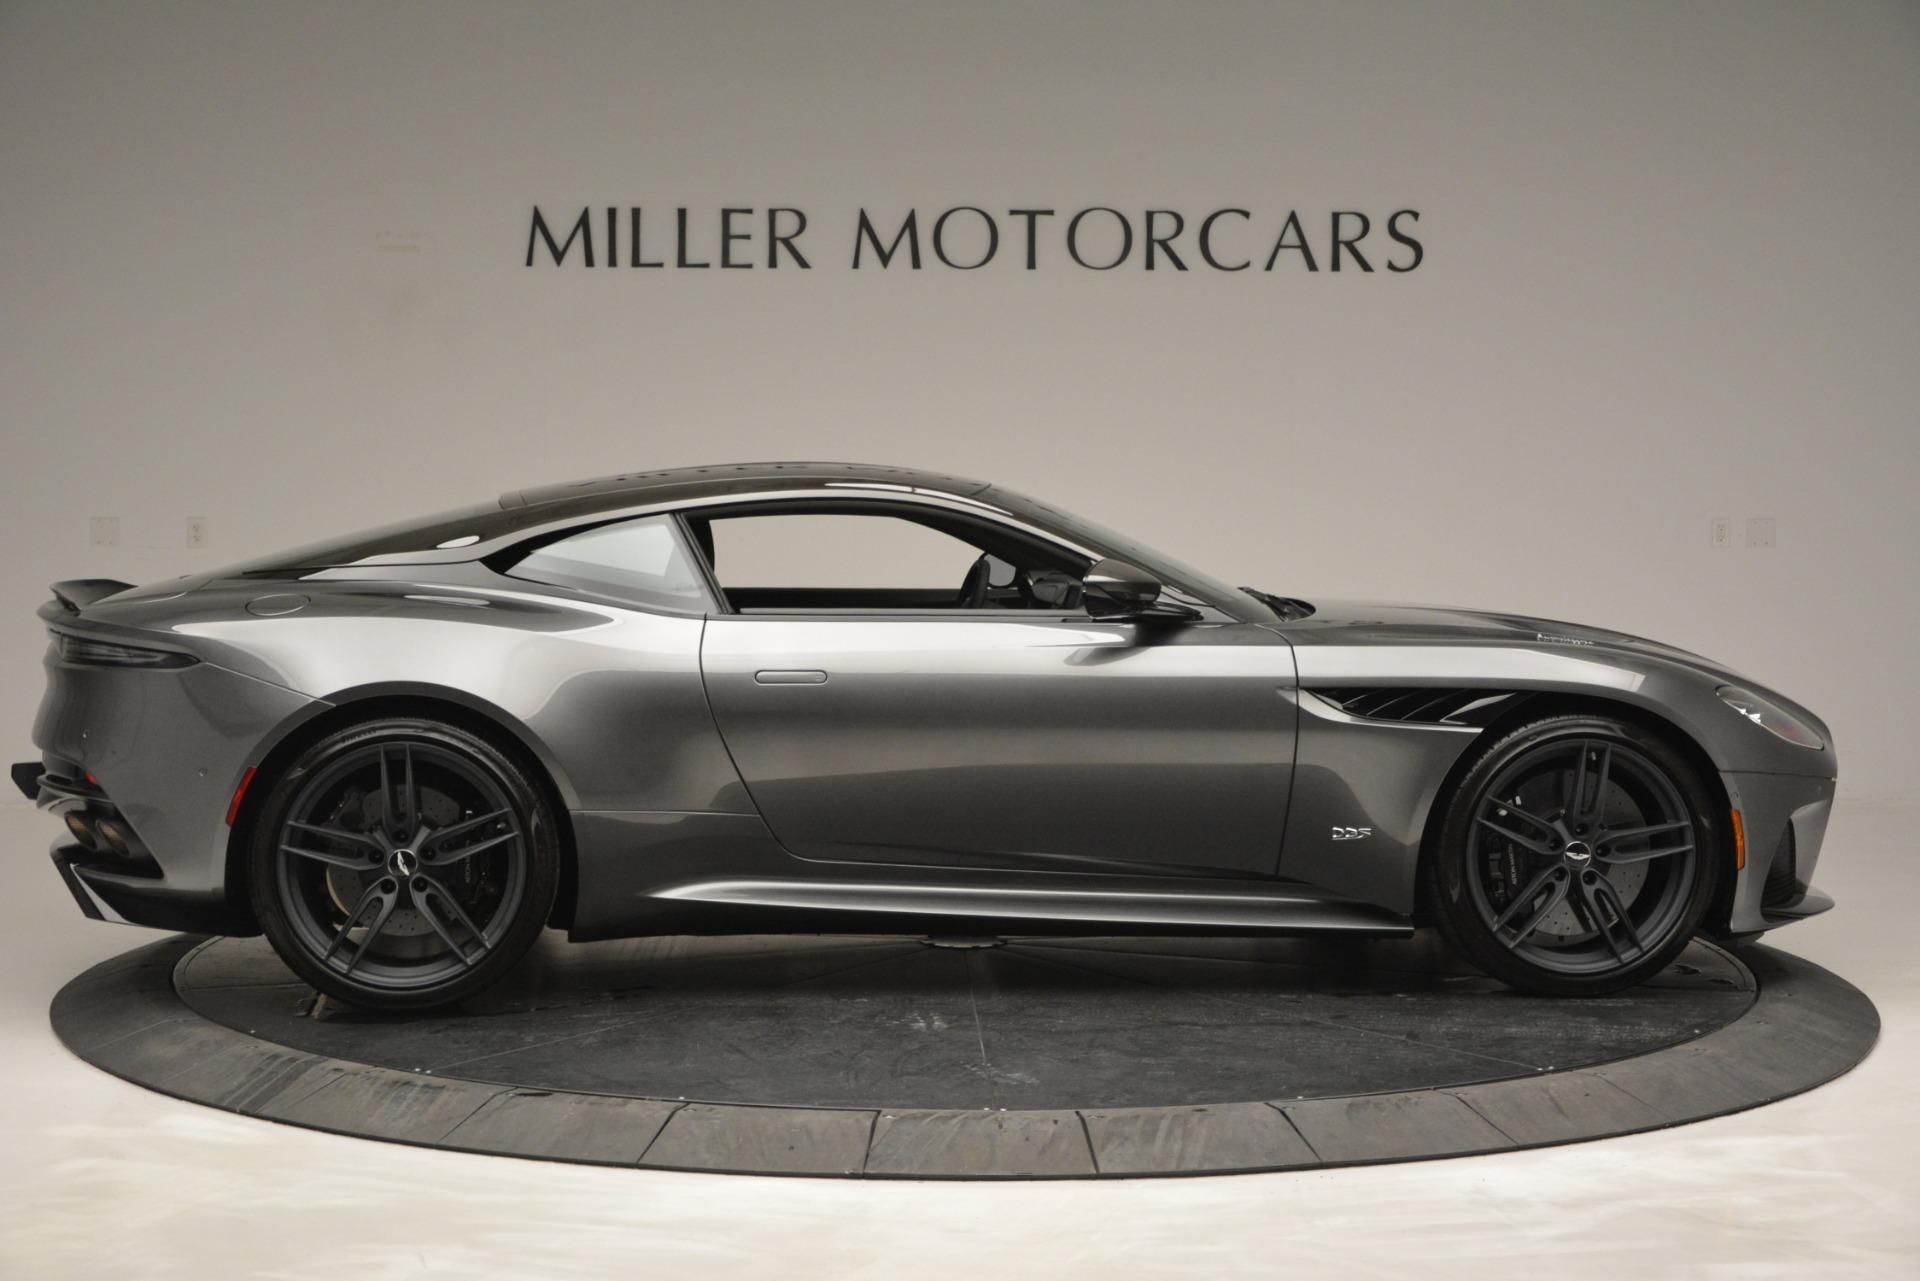 Used 2019 Aston Martin DBS Superleggera Coupe For Sale In Greenwich, CT 2917_p9